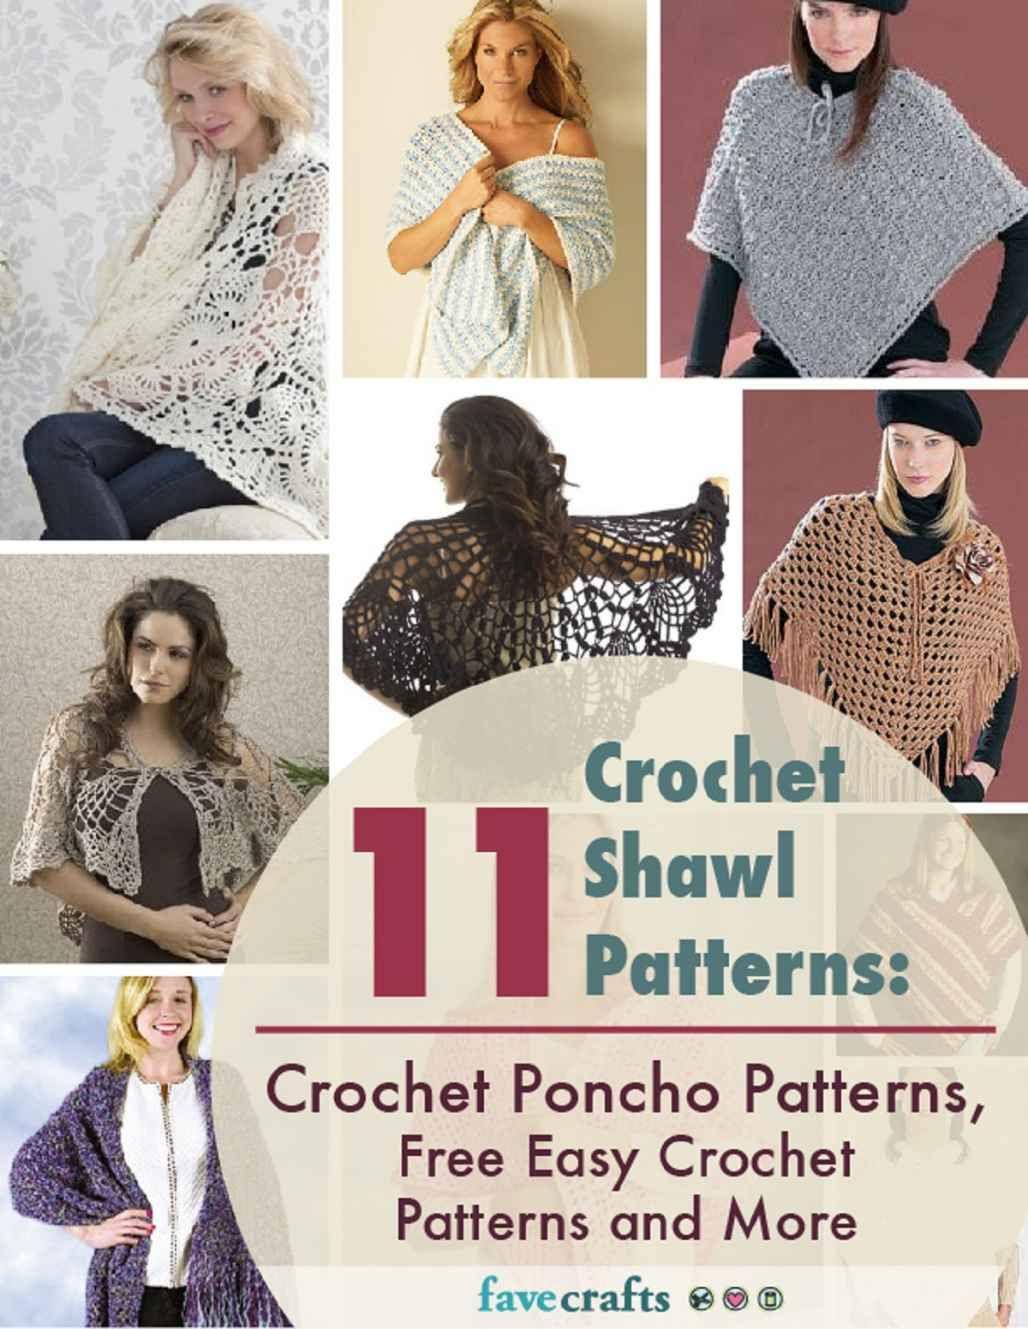 Amazon.com: 11 Crochet Shawl Patterns: Crochet Poncho Patterns, Free ...